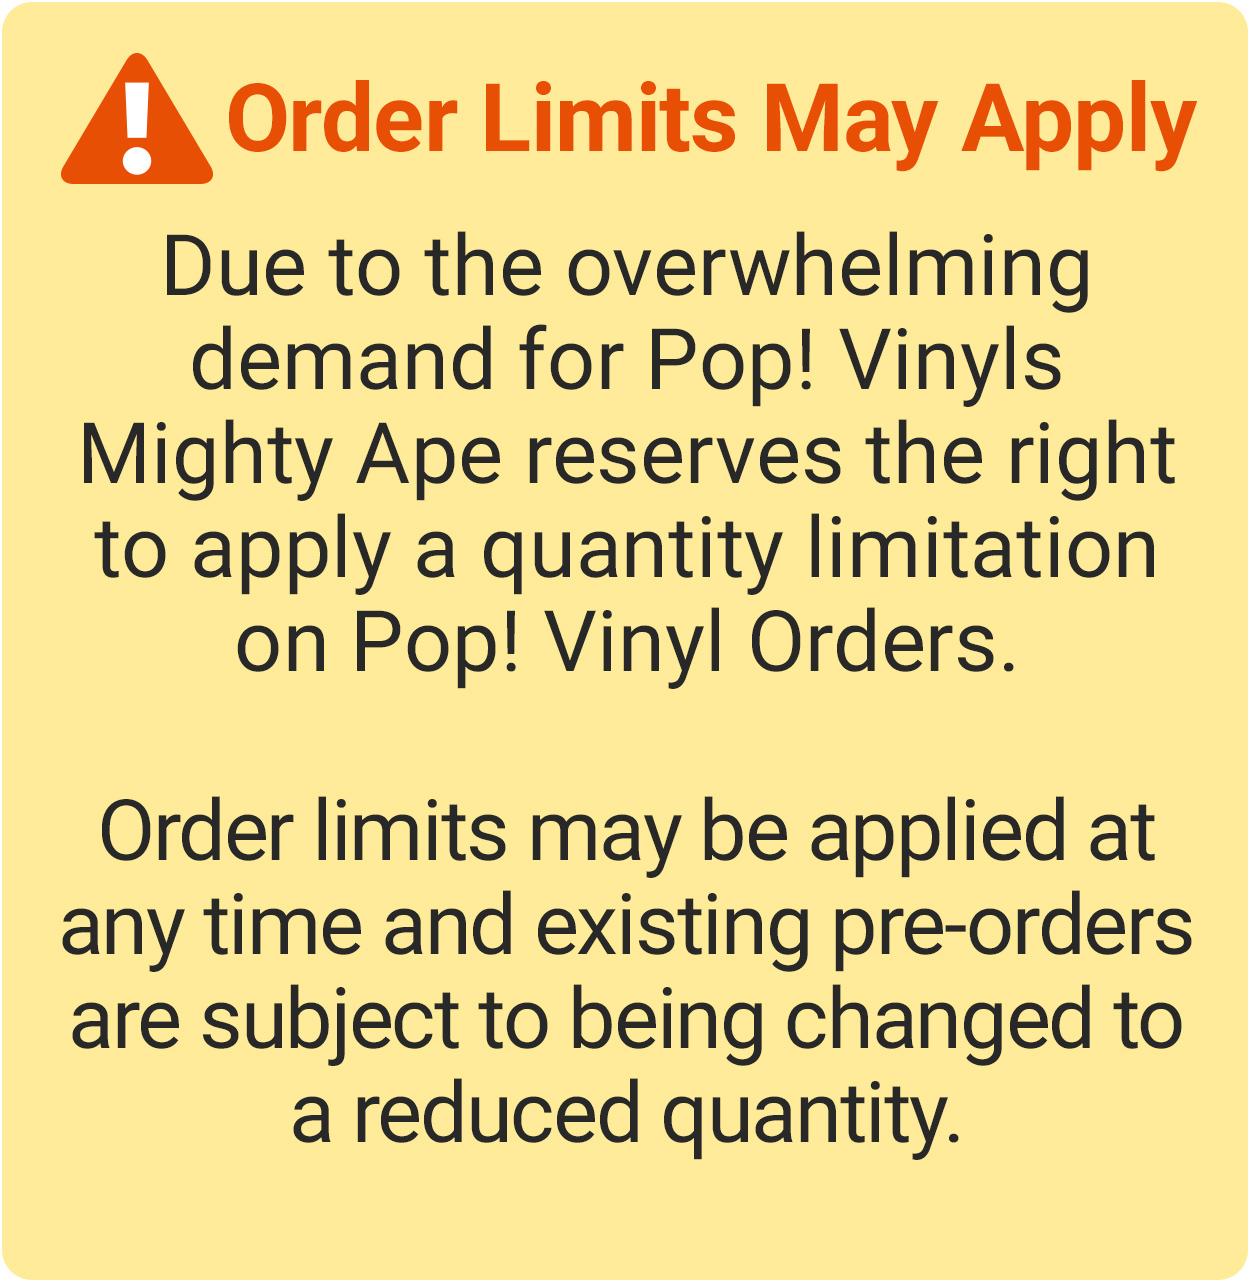 My Hero Academia: Hero Killer Stain - Pop! Vinyl Figure image